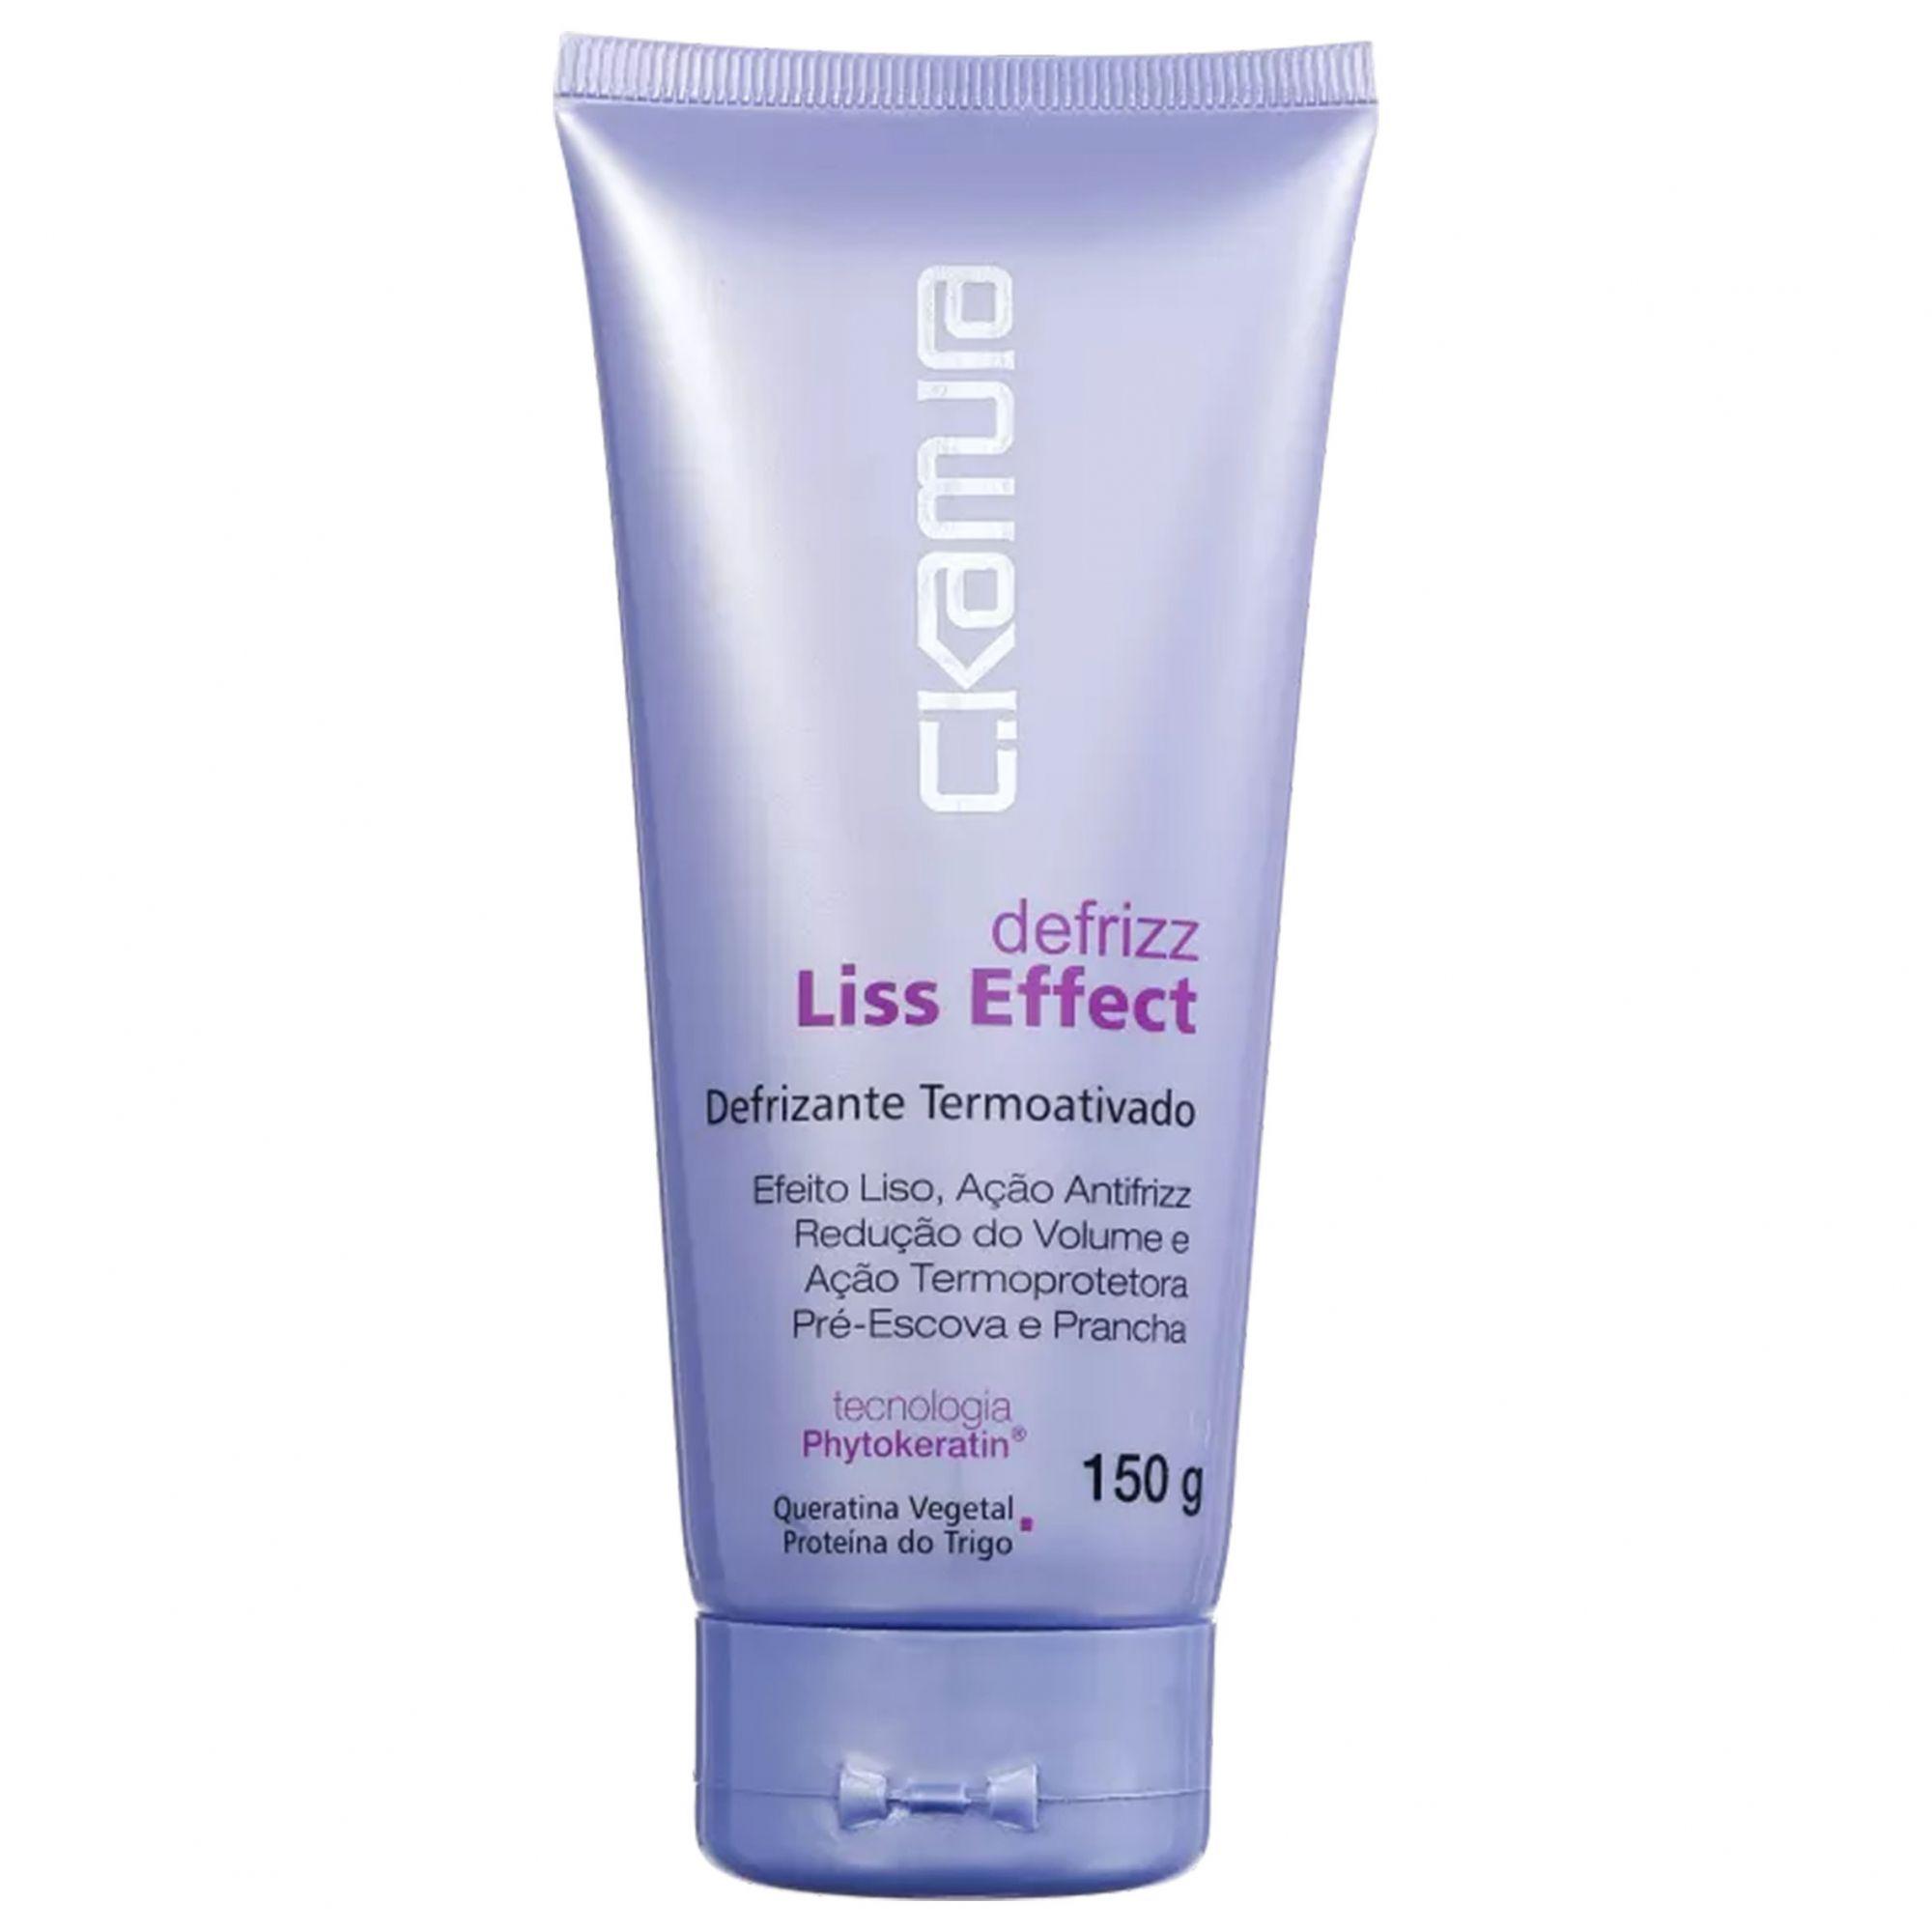 C.Kamura Defrizz Liss Effect - Creme Anti-Frizz 150g.